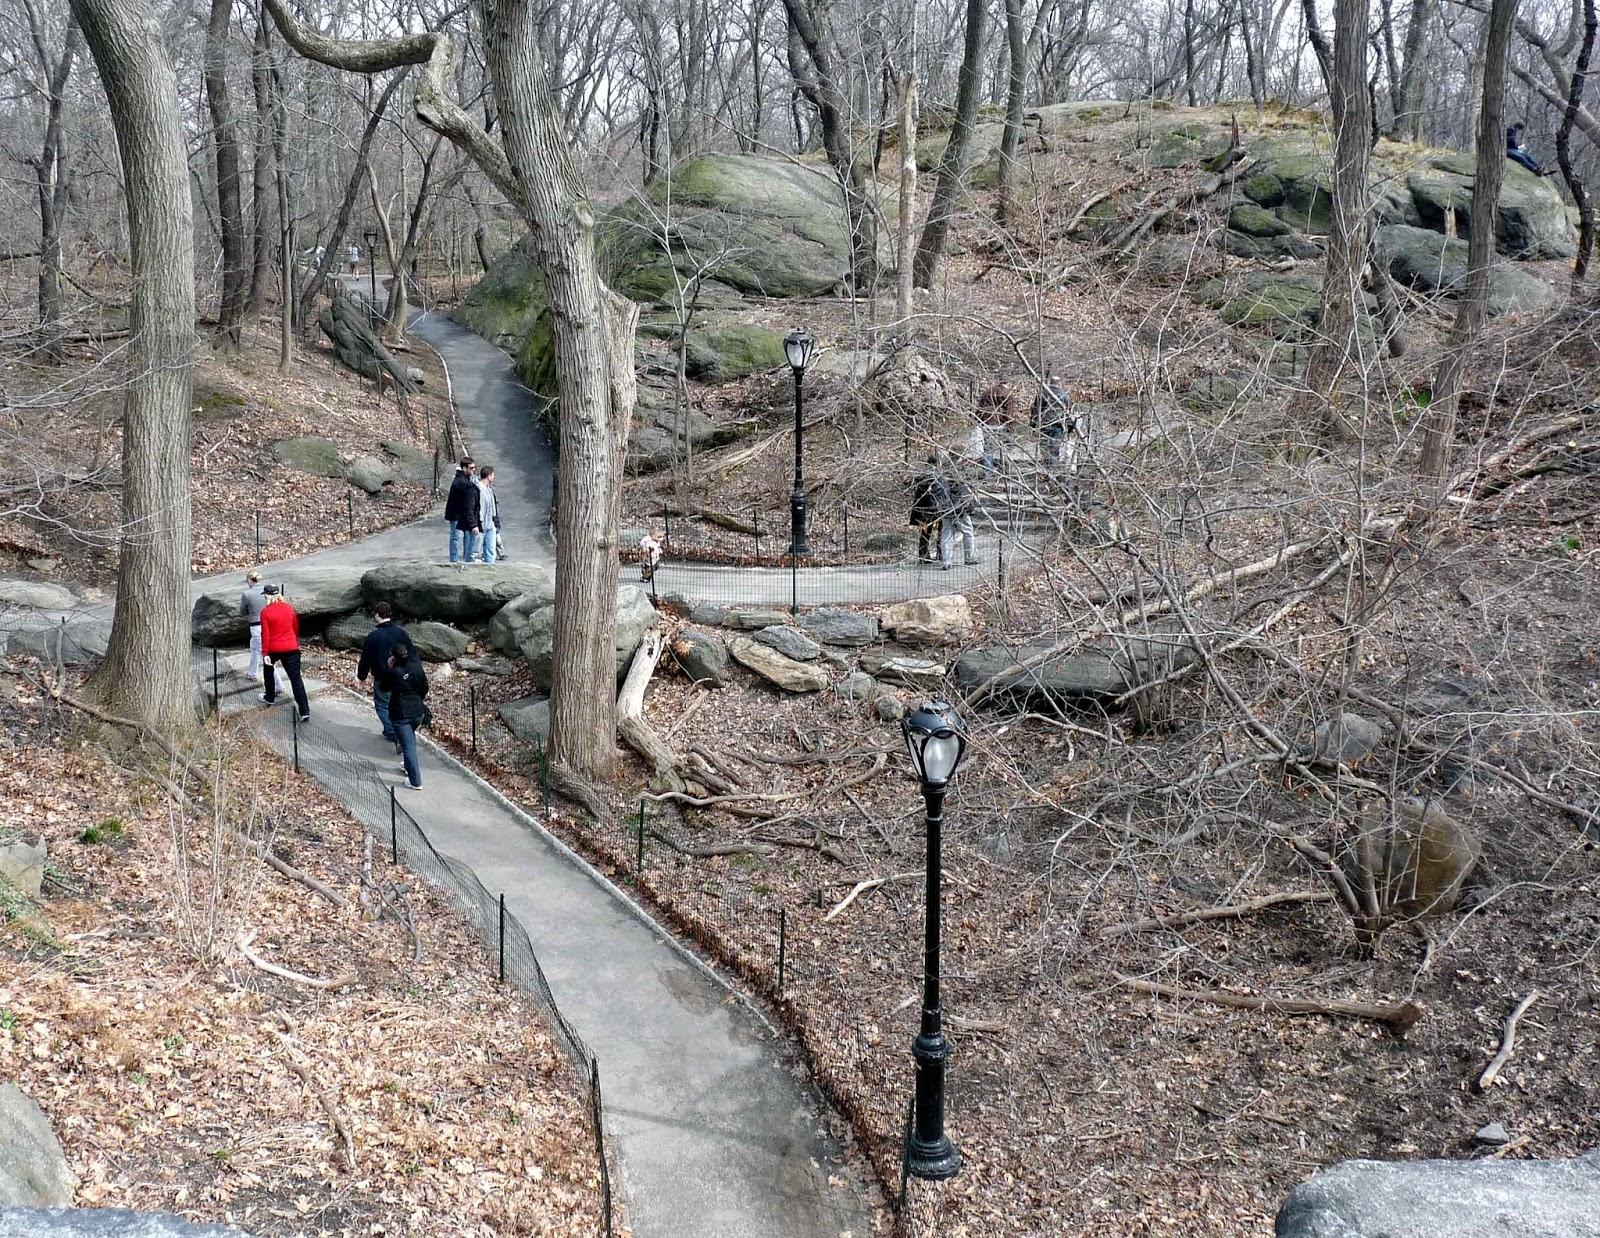 ramble central park gay